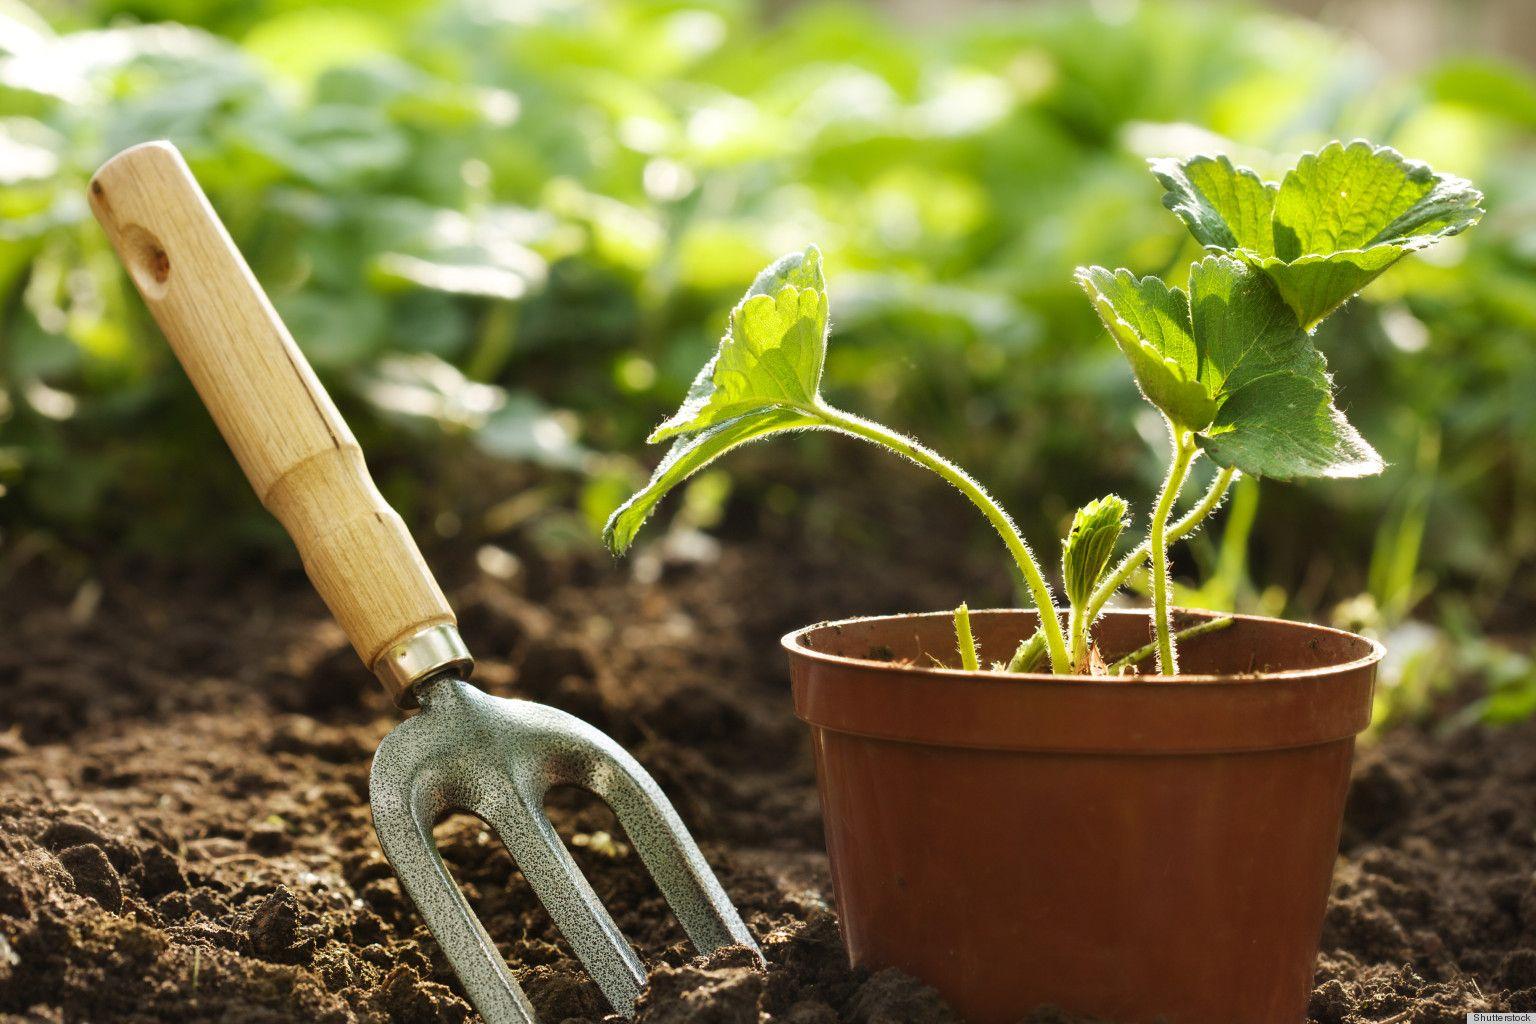 The Absolute Best Gardening Tools   Gardens, Organic gardening and ...